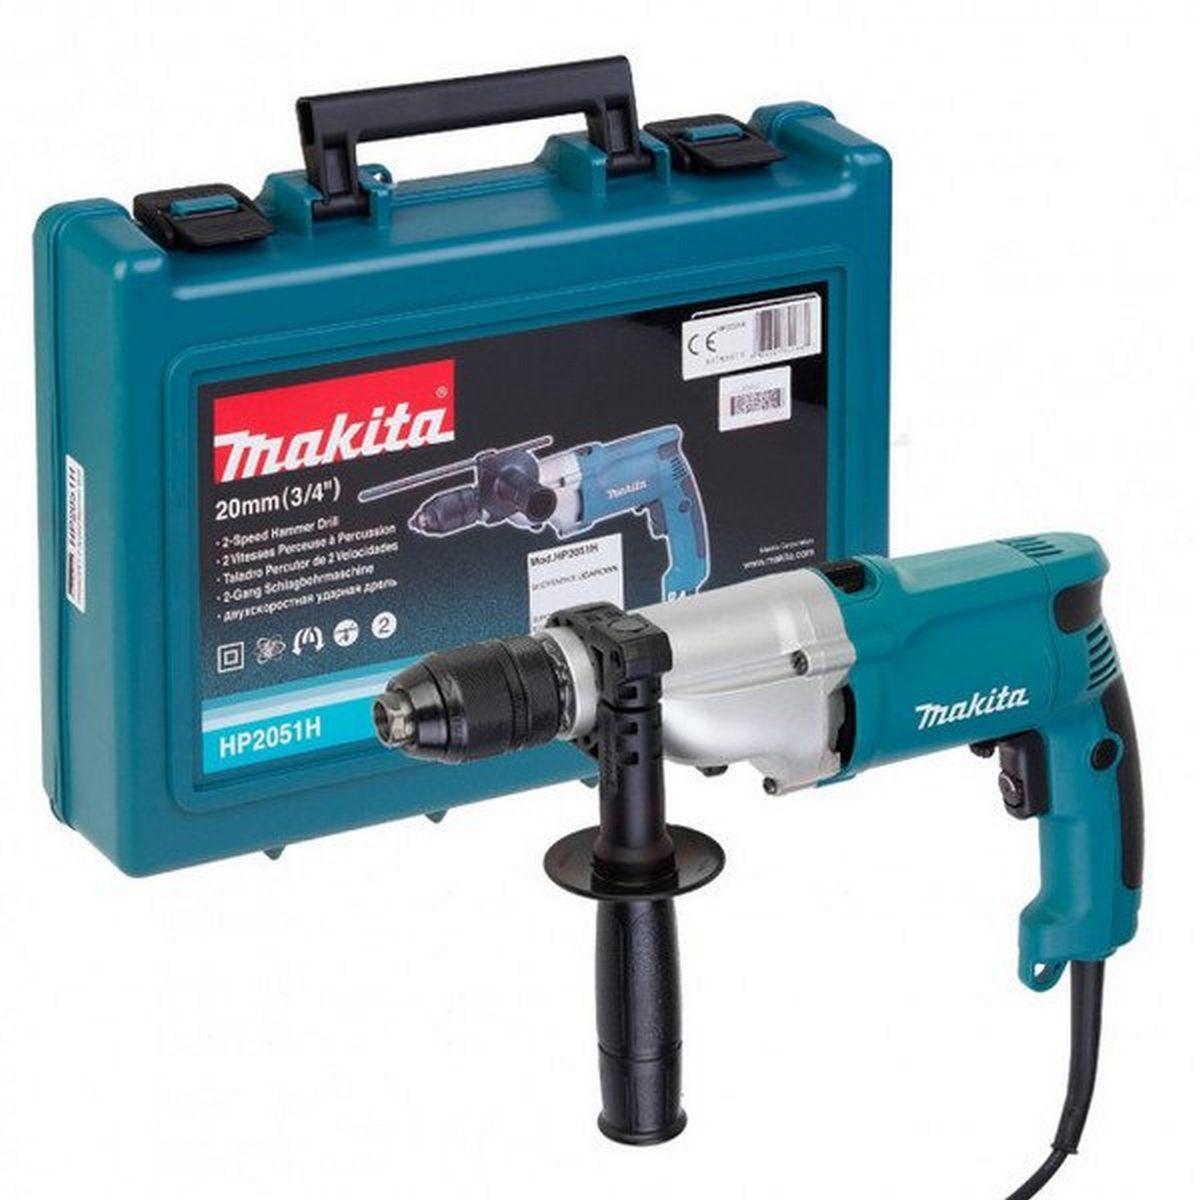 Makita HP0300 коробка 320 Вт 56 Н·м